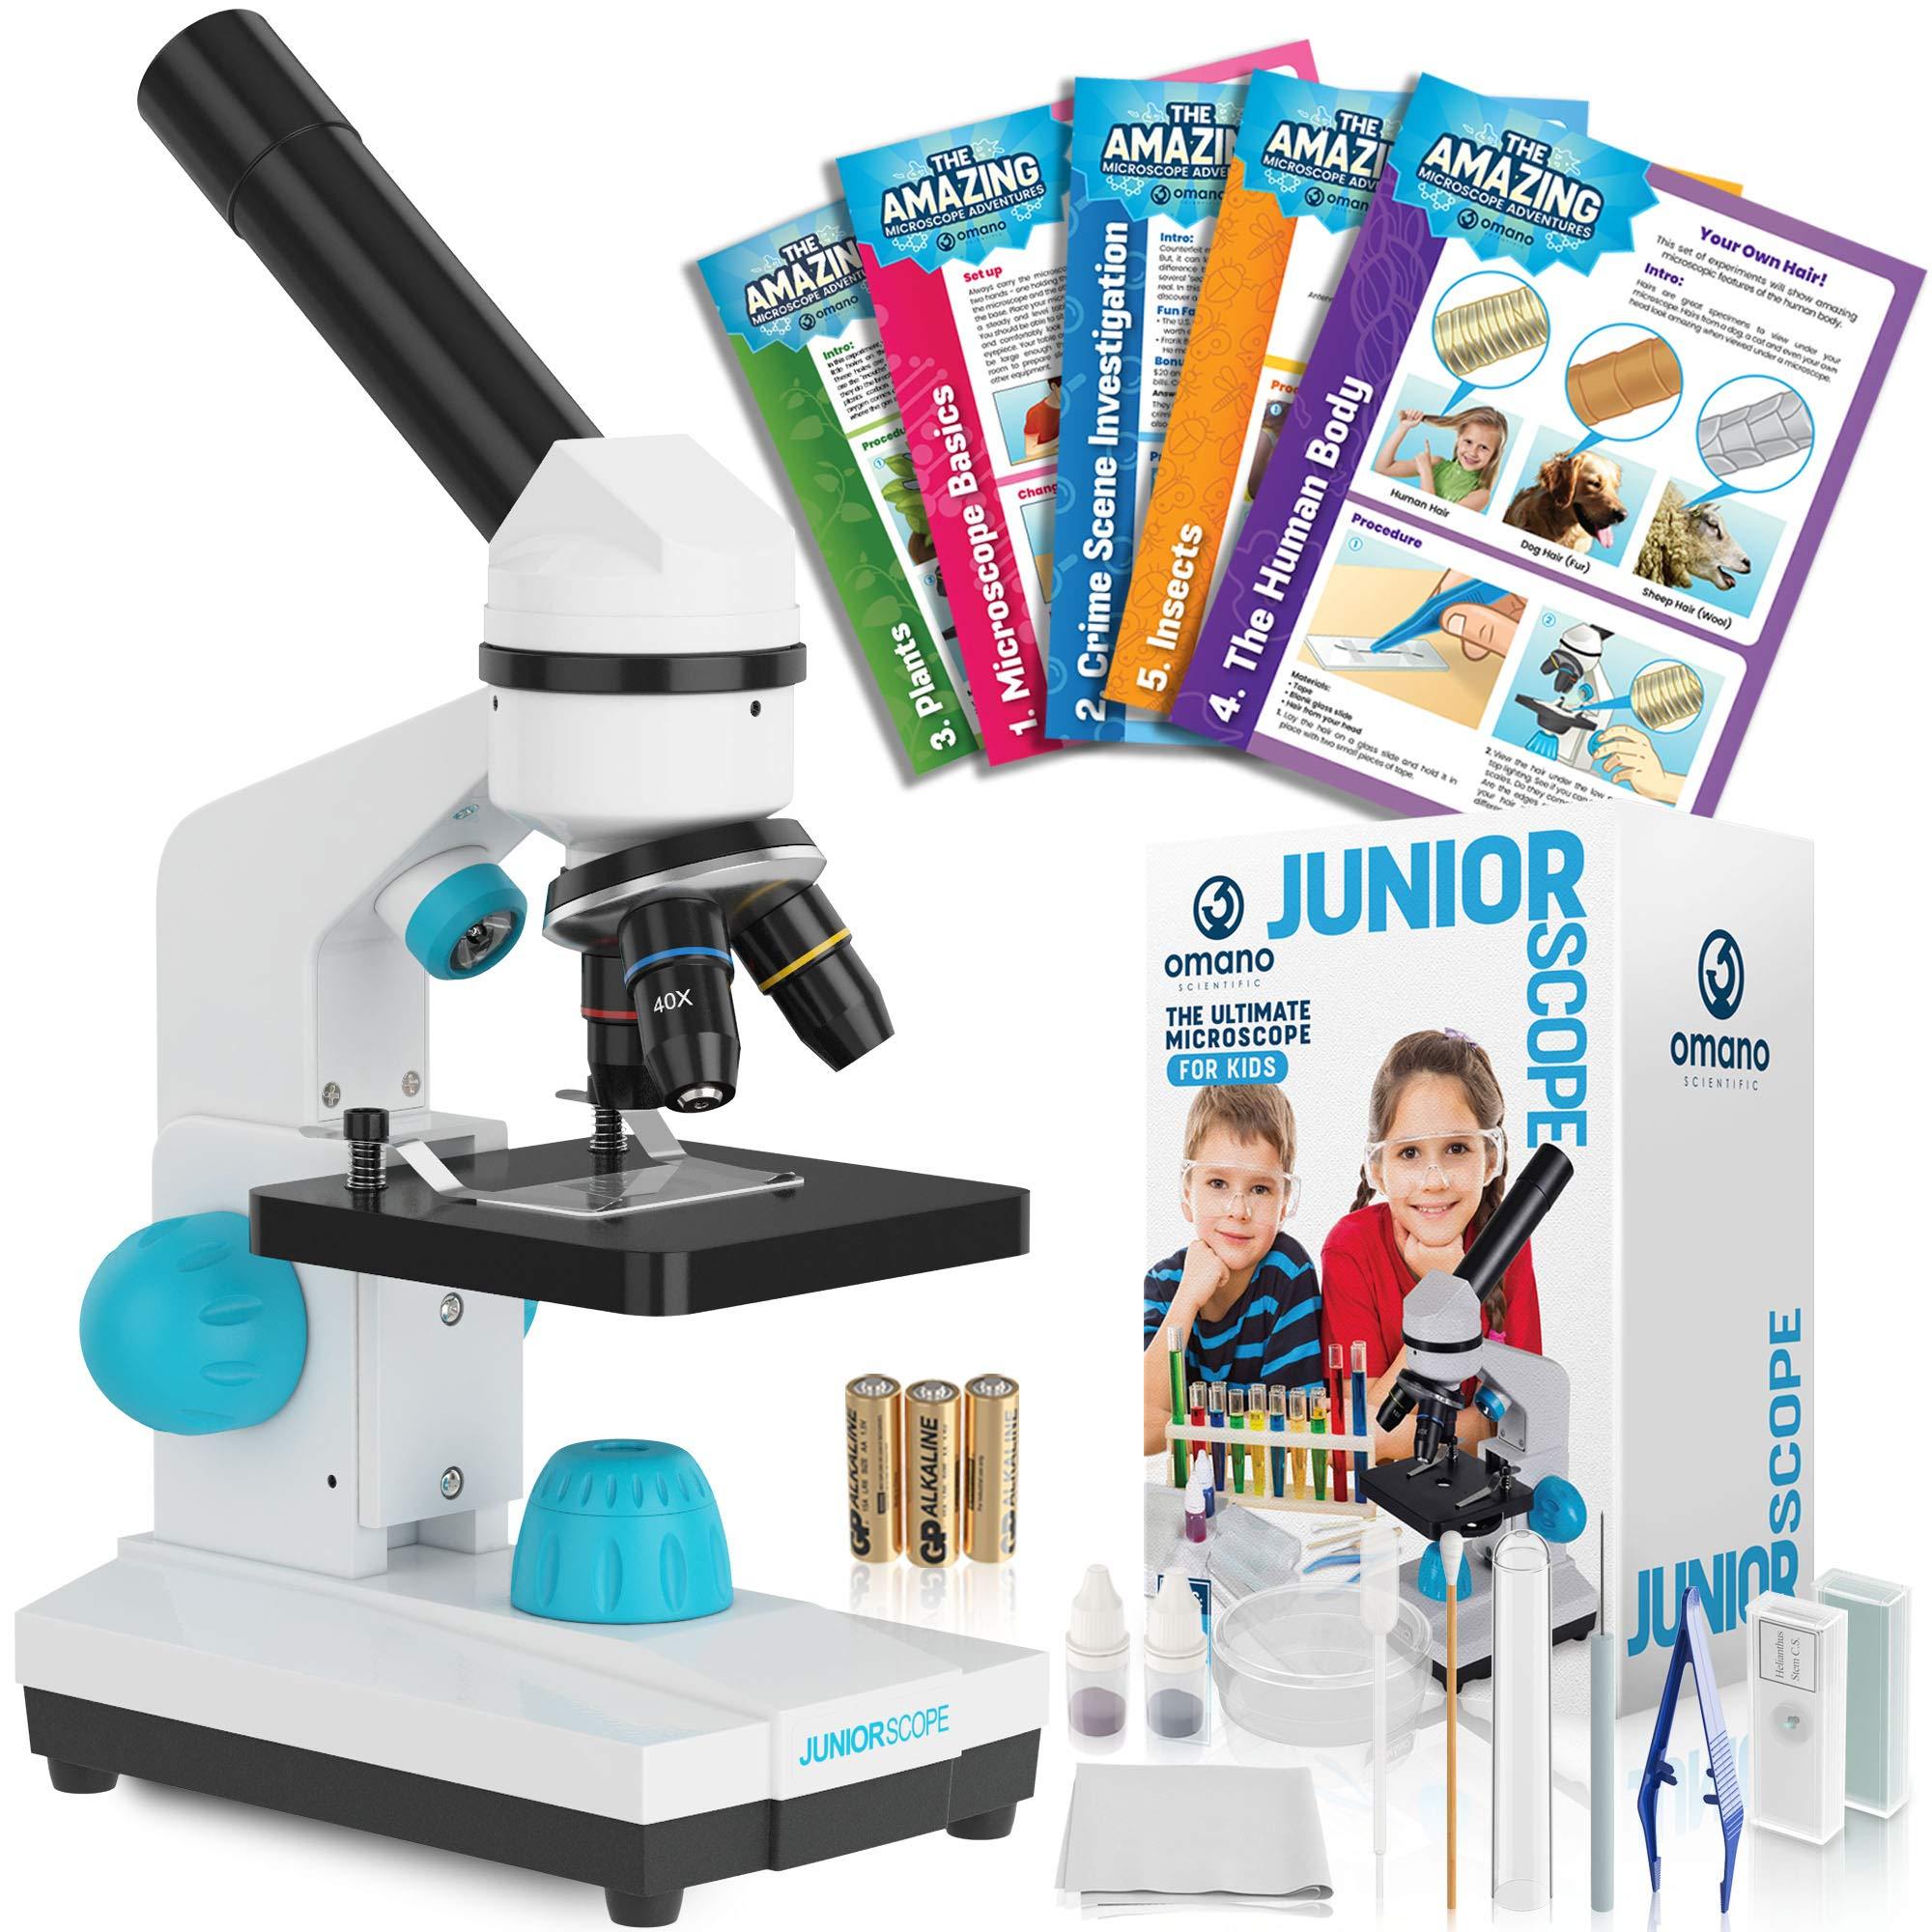 Omano JuniorScope Microscope for Kids Microscope Science Kits for Kids Science Experiment Kits by Omano